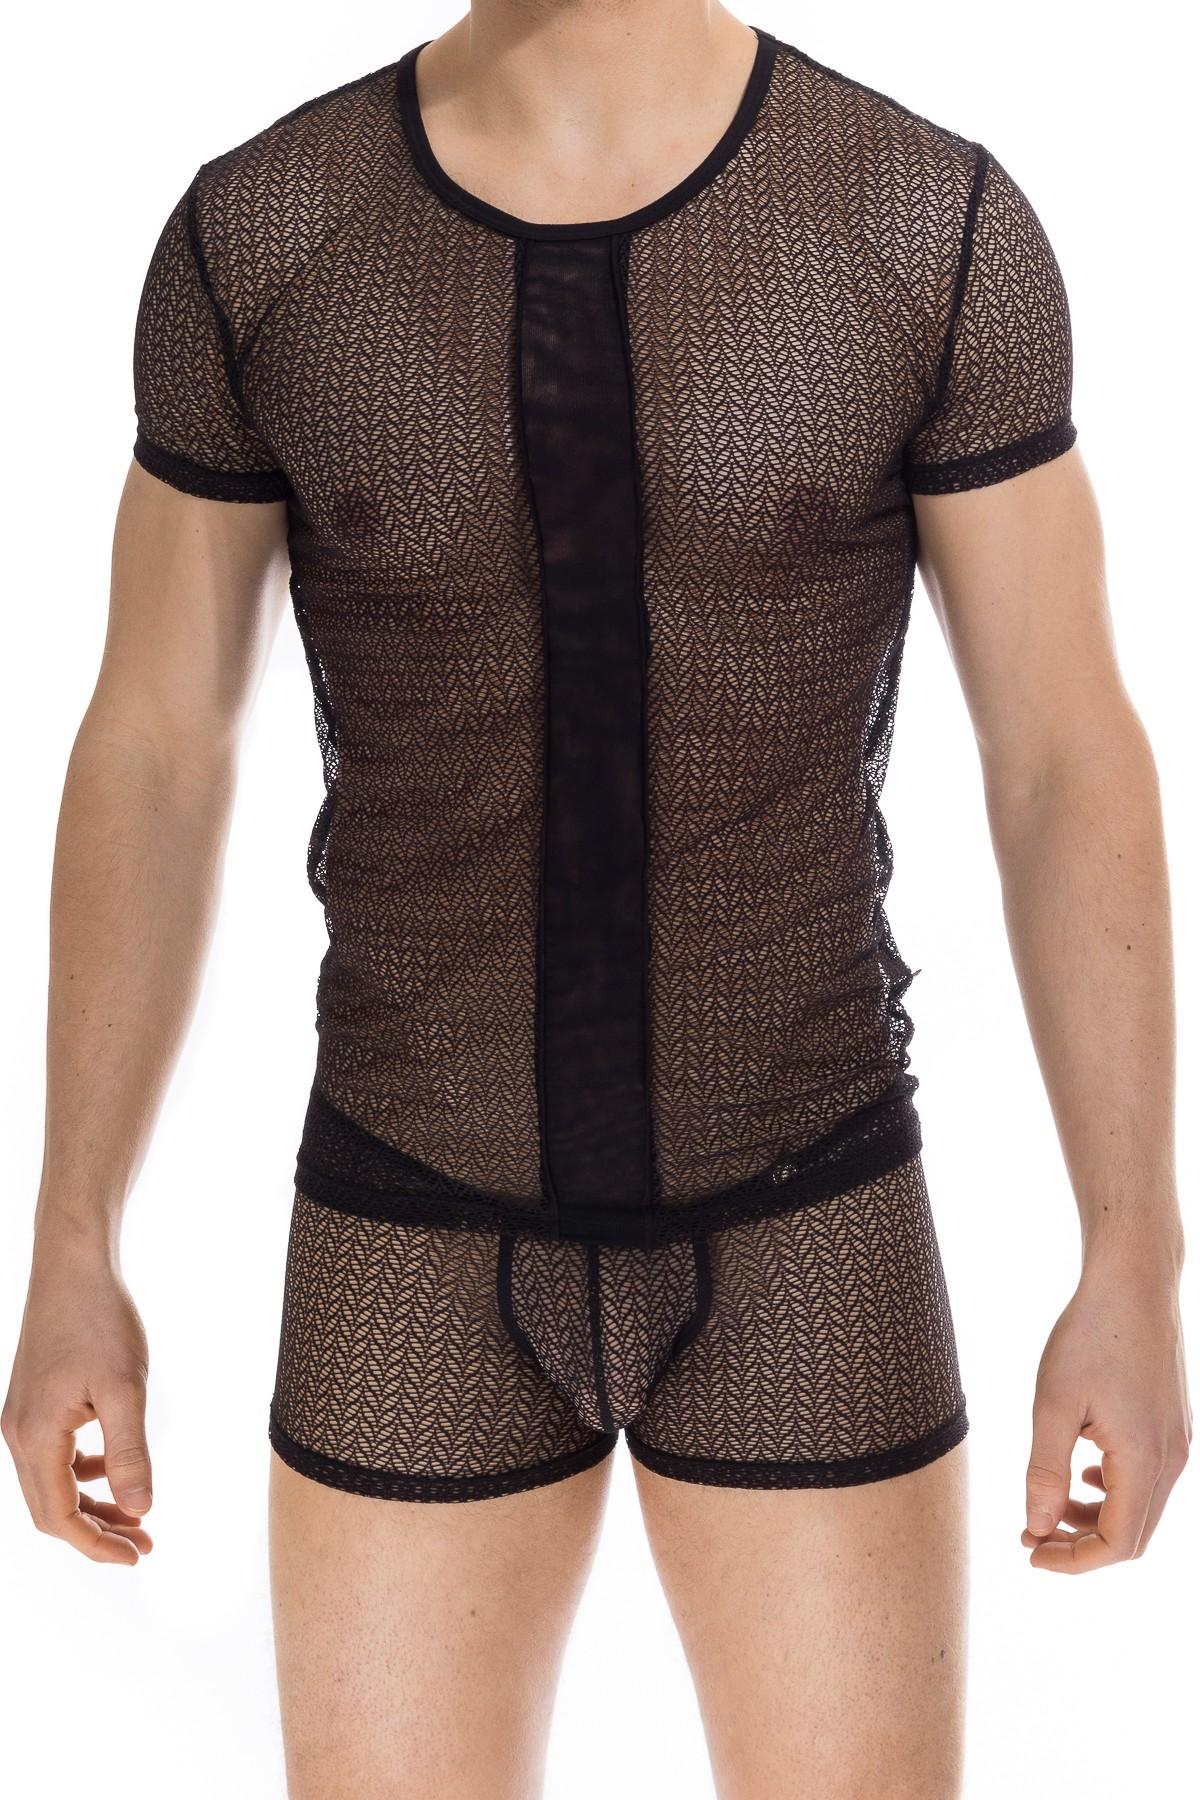 948a80d77175 Viridios Black - T shirt - Mens sexy designer lace mesh tshirt ...